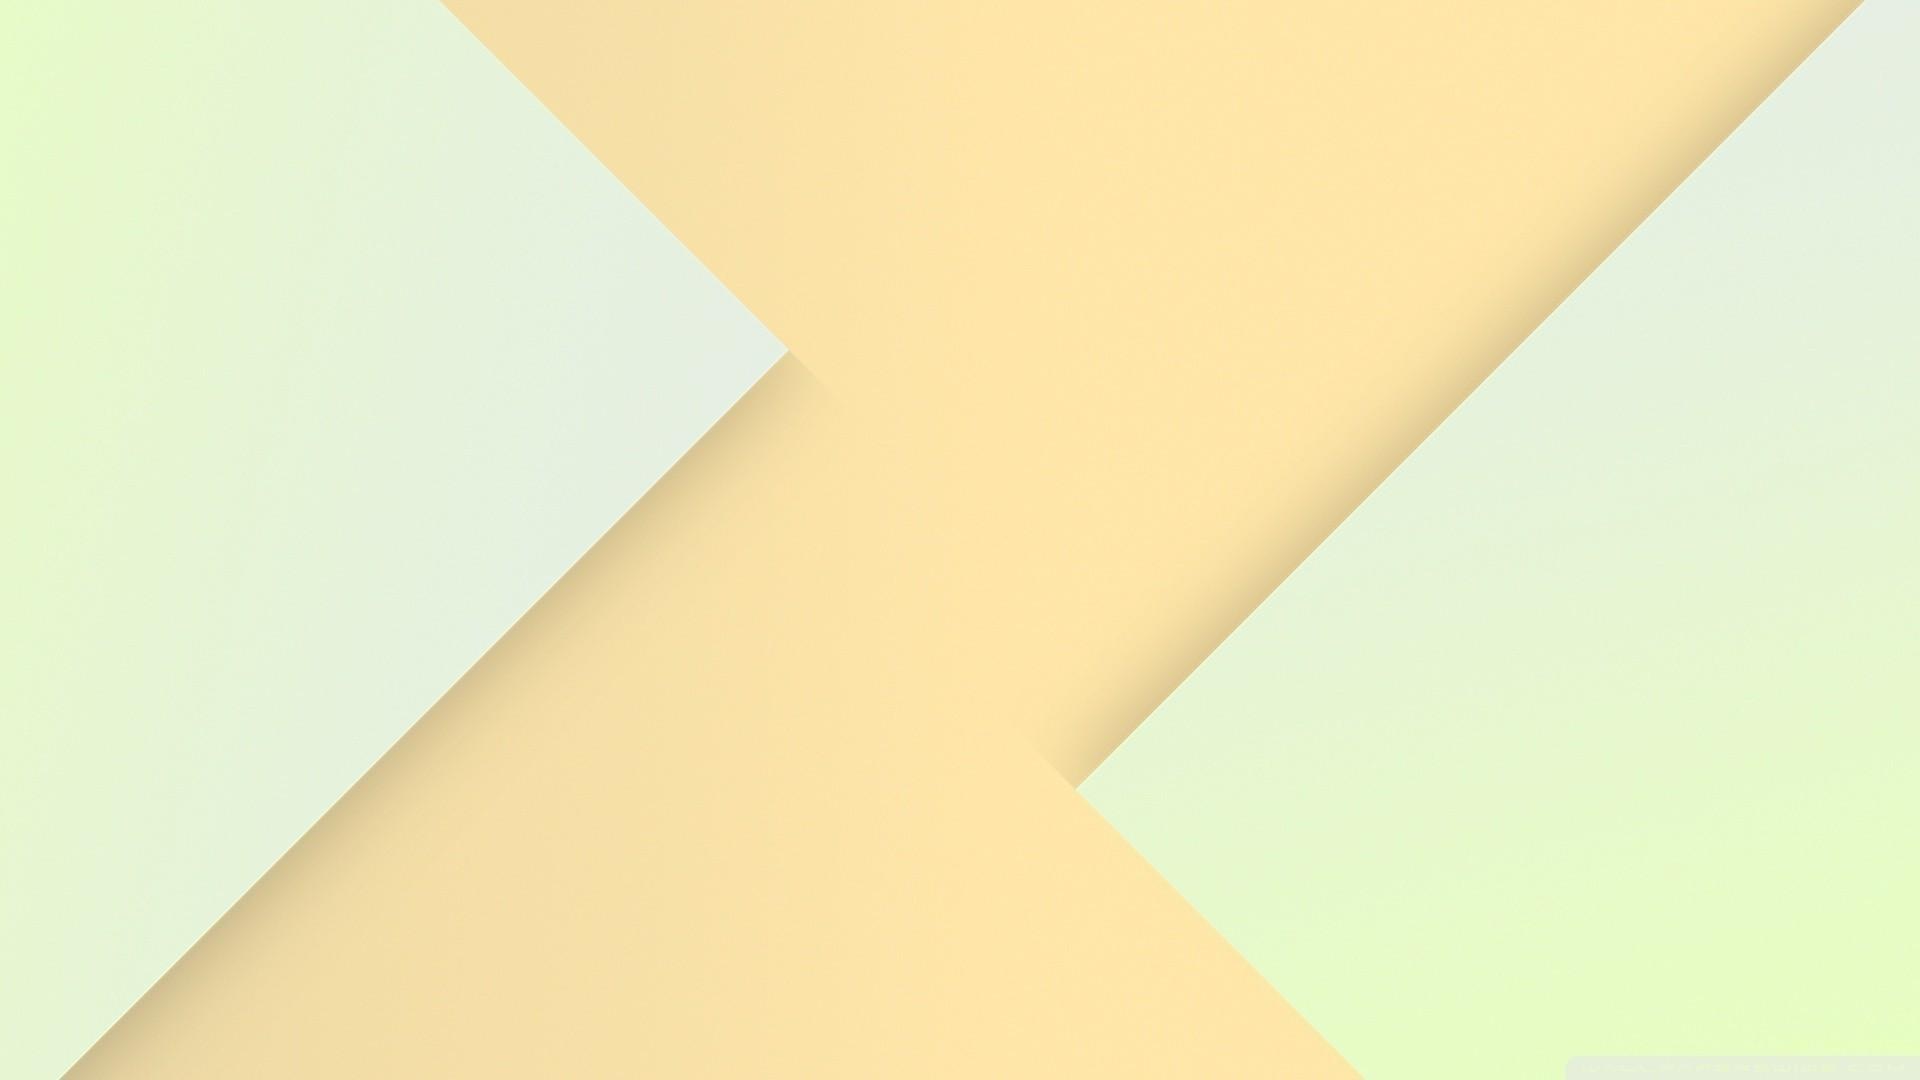 Pastel Color Full HD Wallpaper